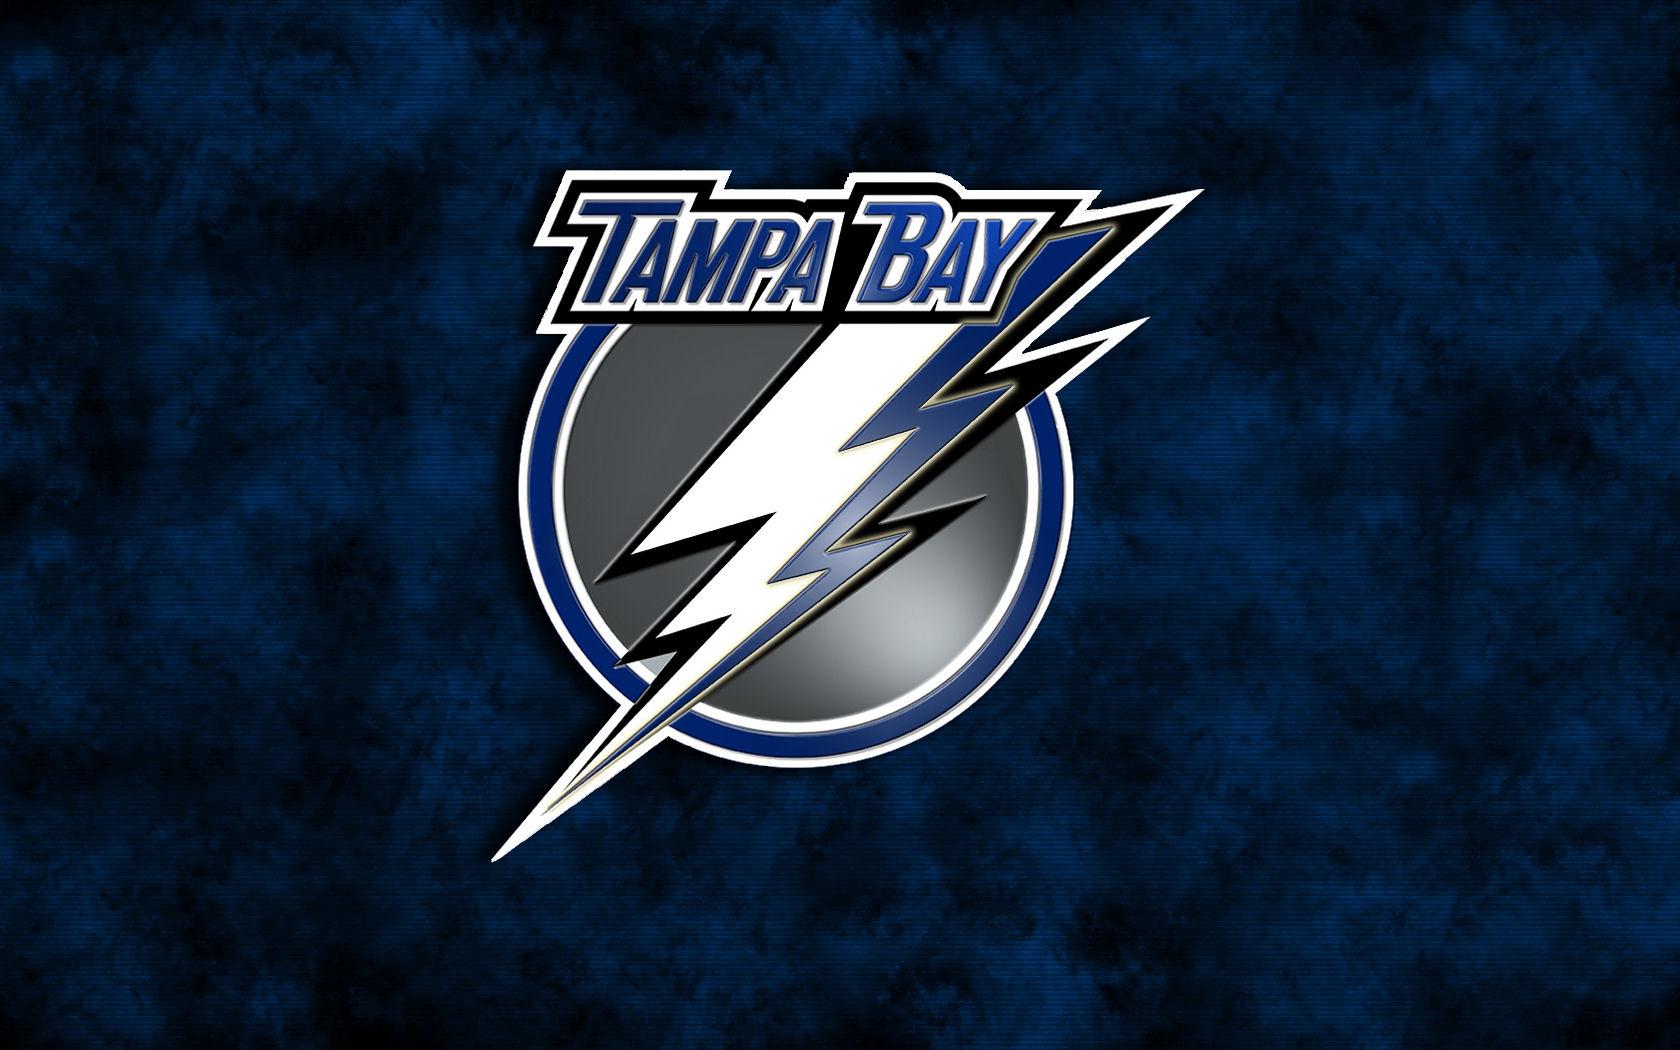 Tampa Bay Lightning by BLUExDEVILZ on DeviantArt